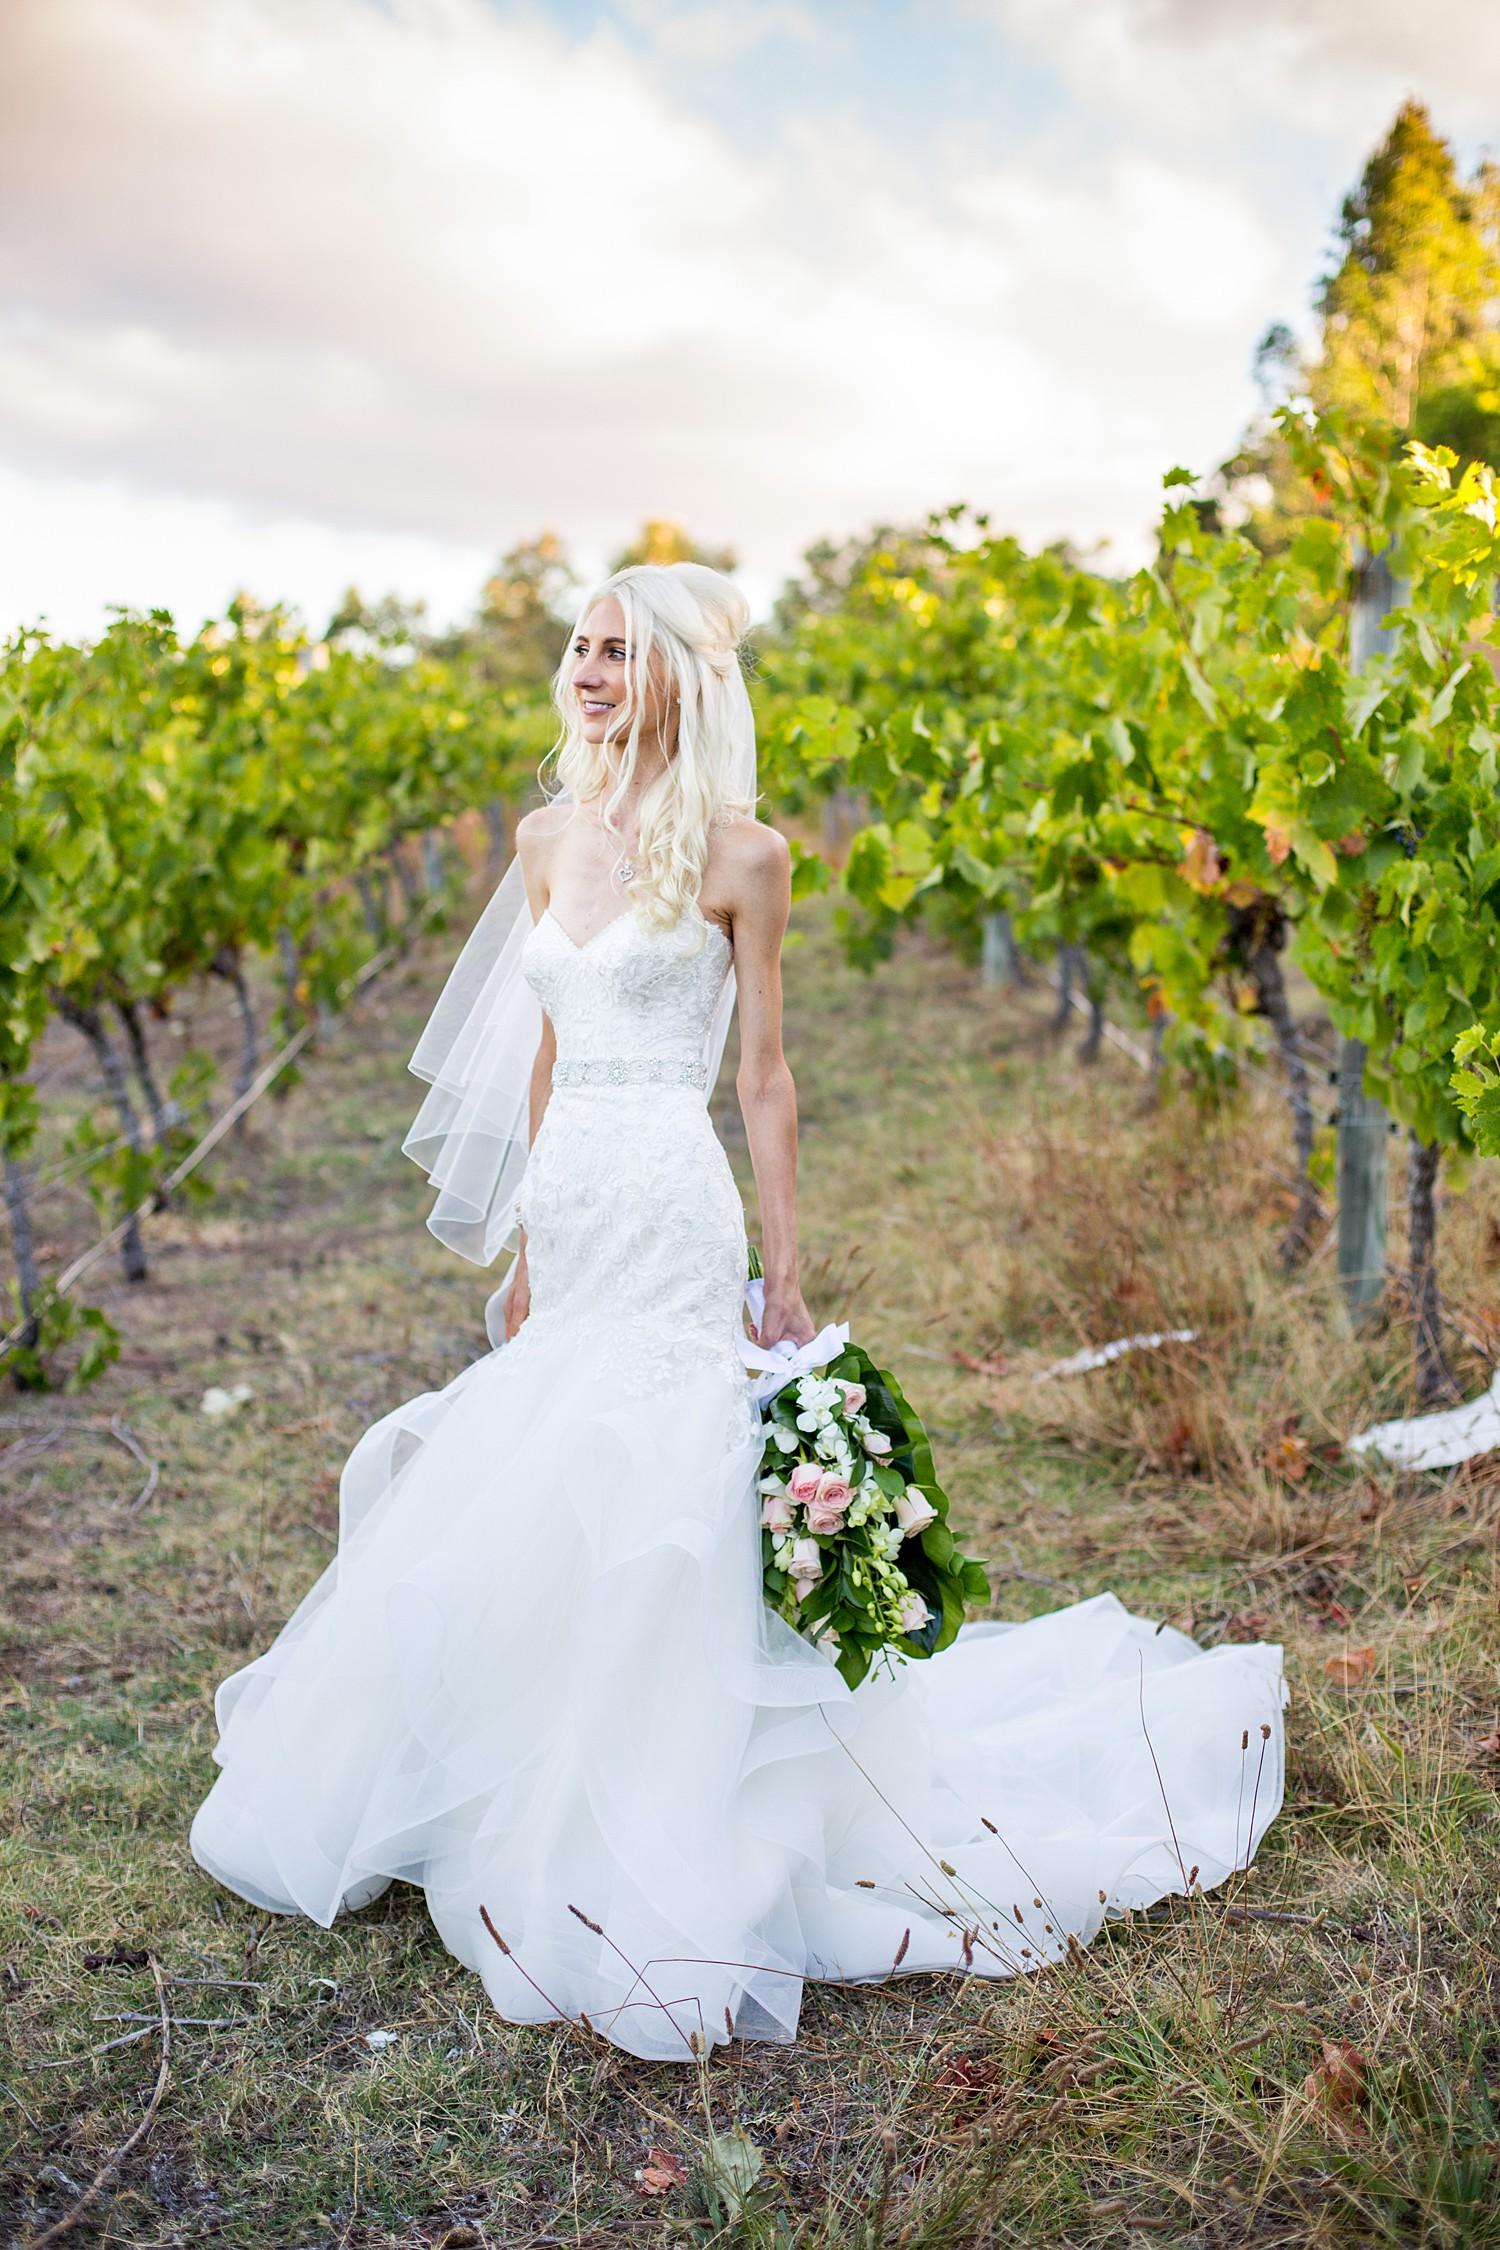 wise_wines_southwest_WA_wedding_0103.jpg